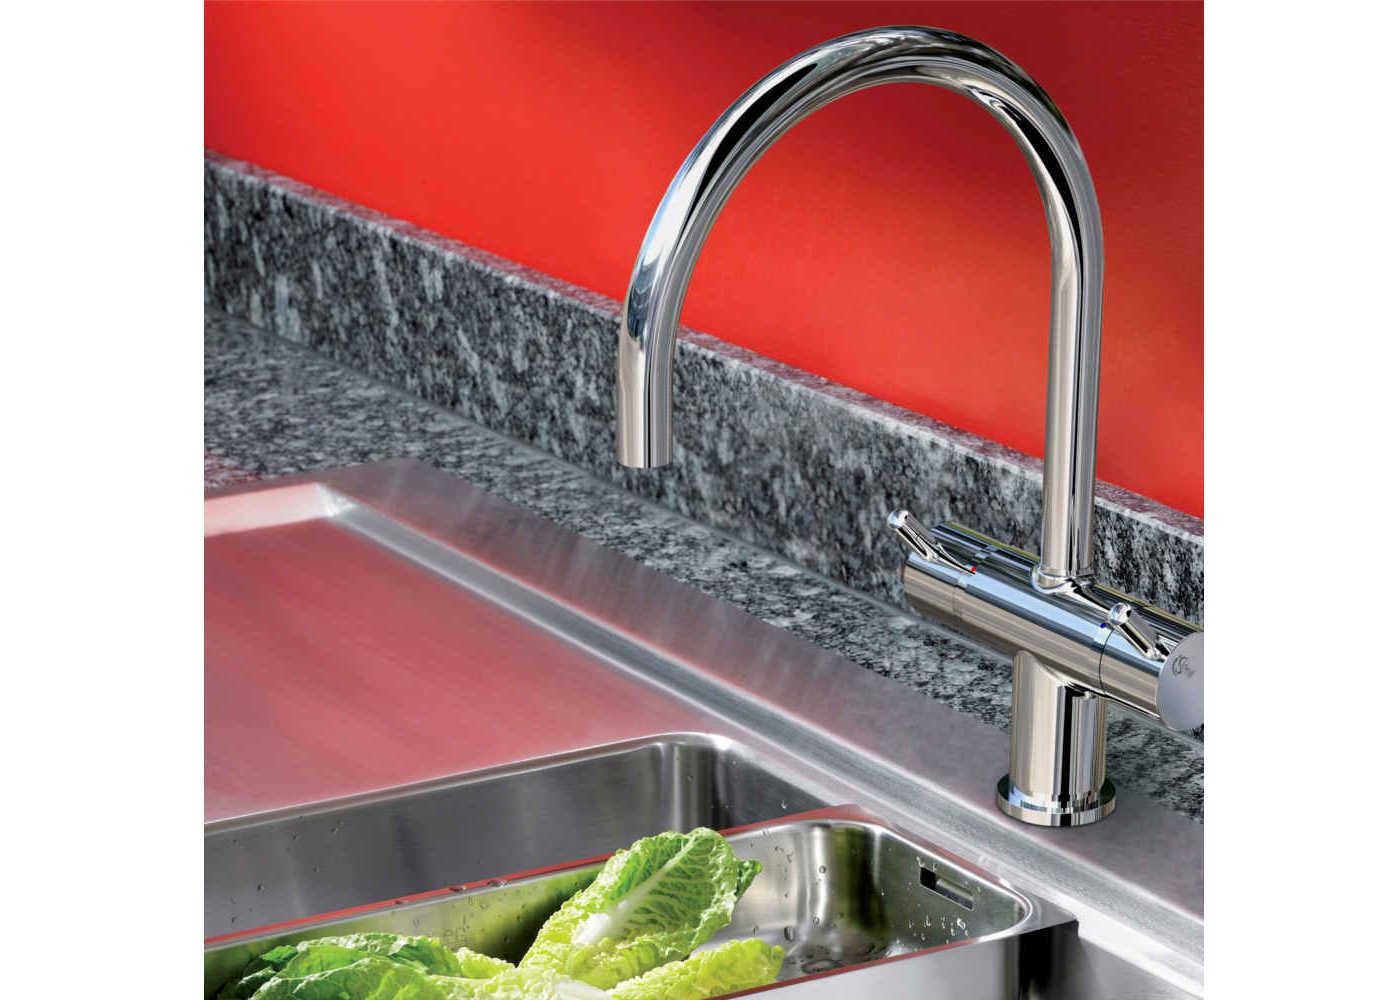 Comment choisir son robinet de cuisine ? | Leroy Merlin